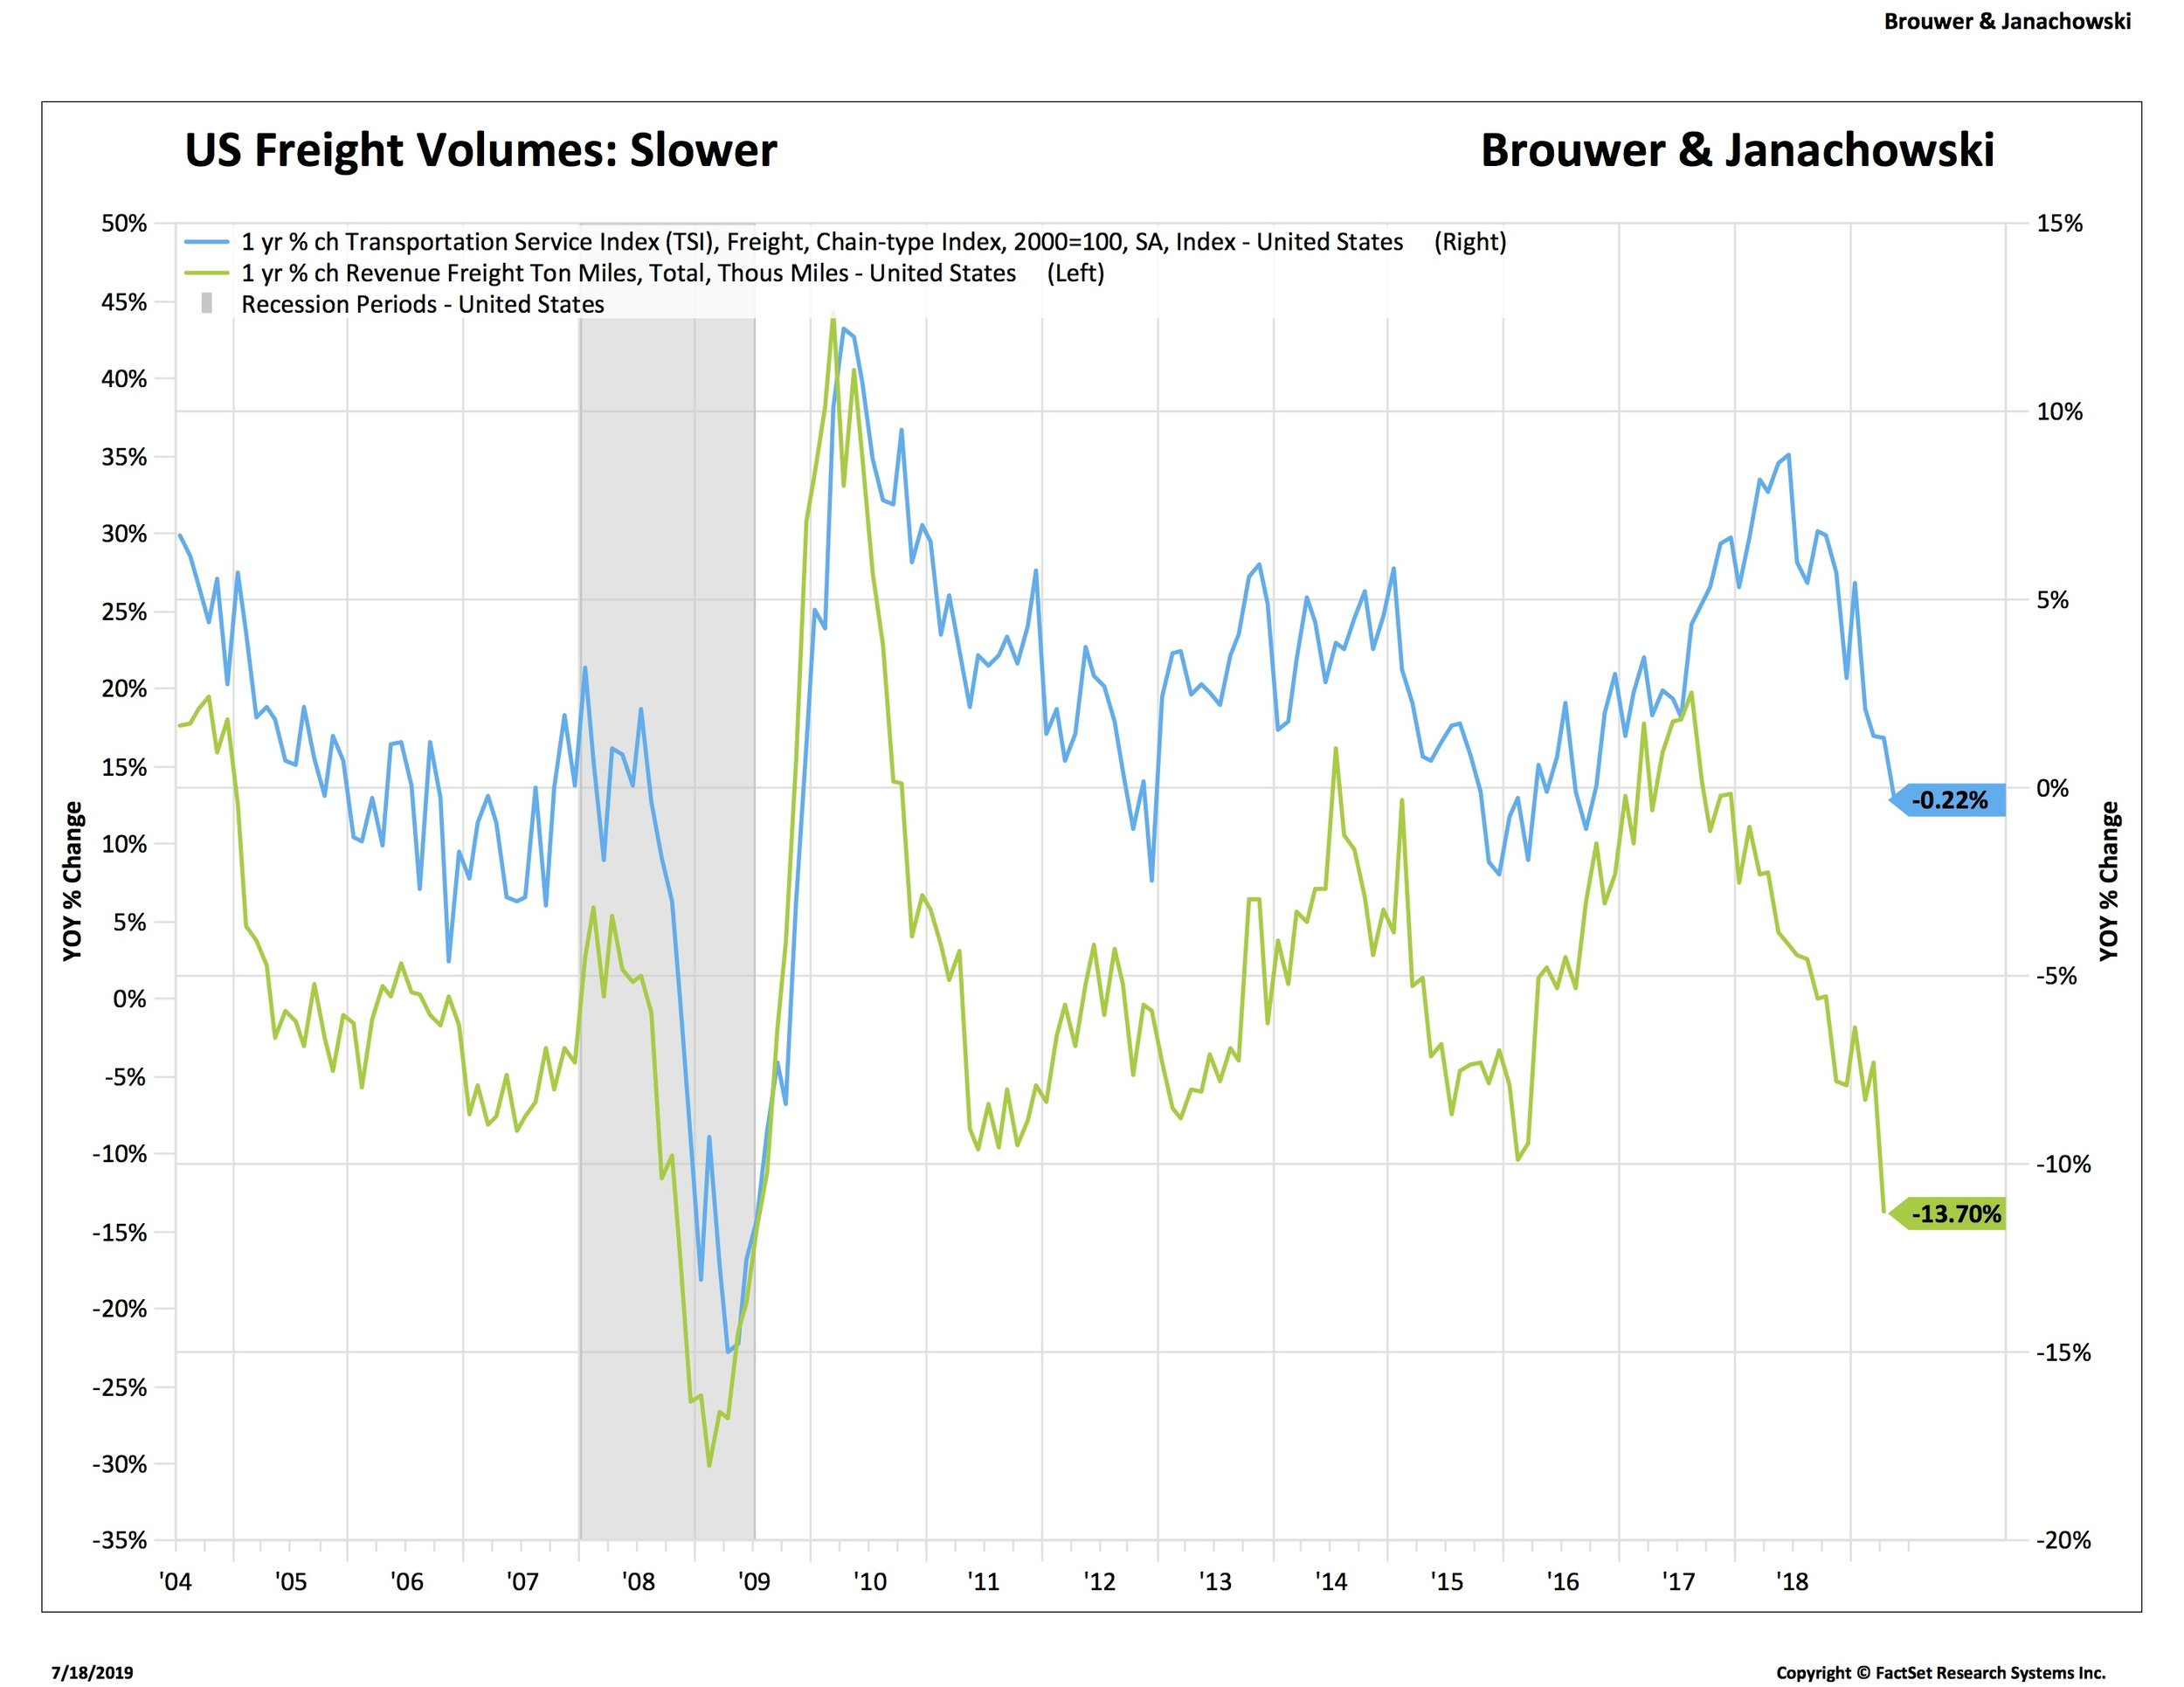 Freight volumes falling